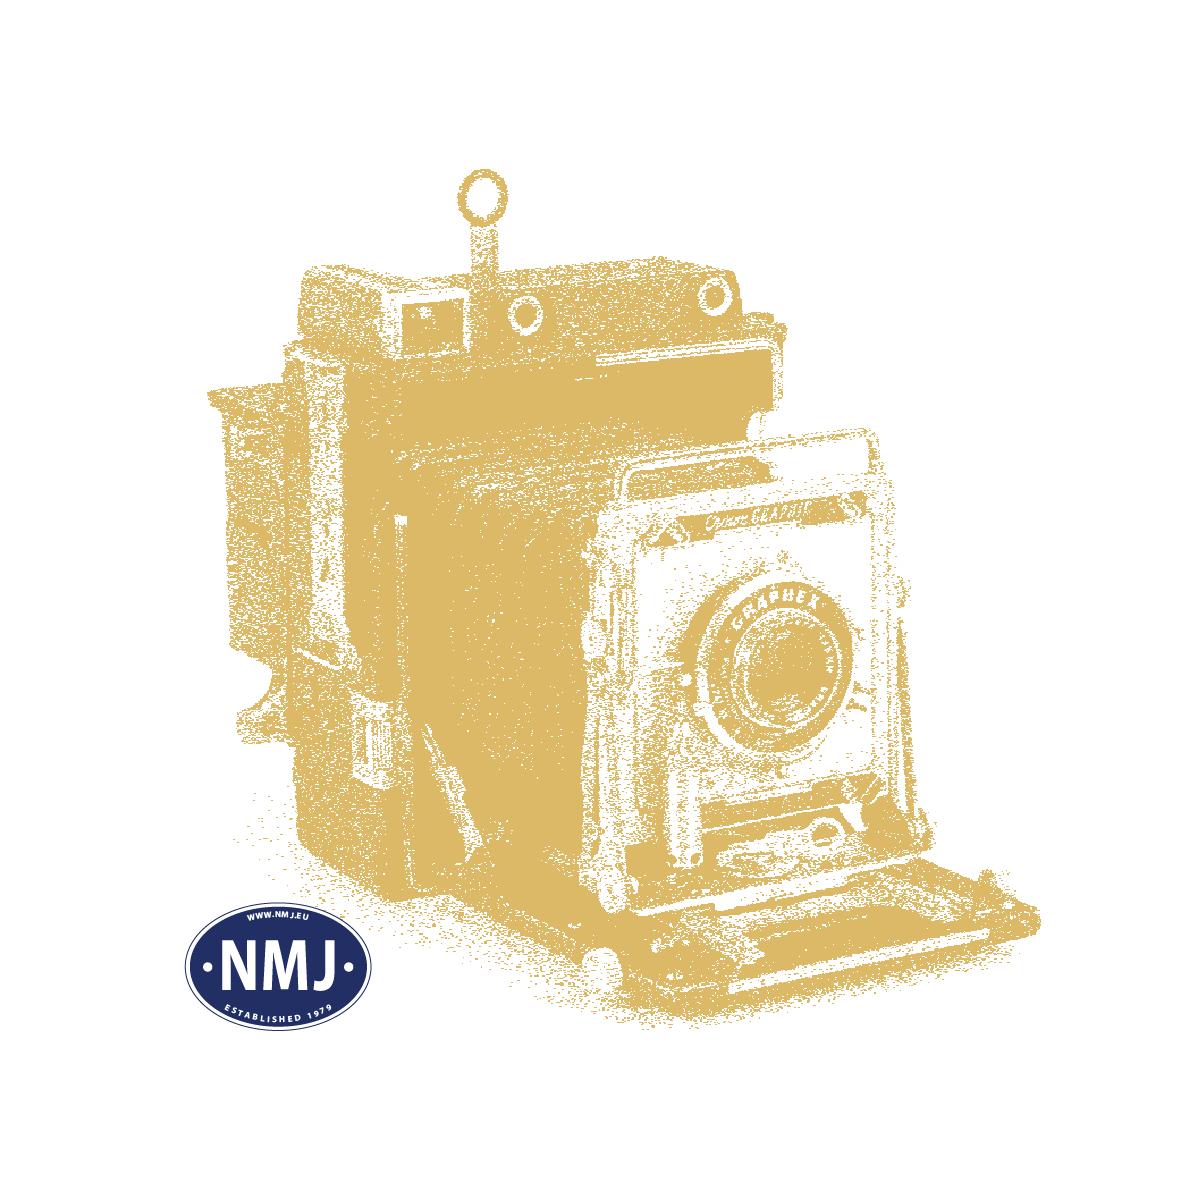 NMJT199.104 - NMJ Topline Bahnreisende, stehend, Set #2